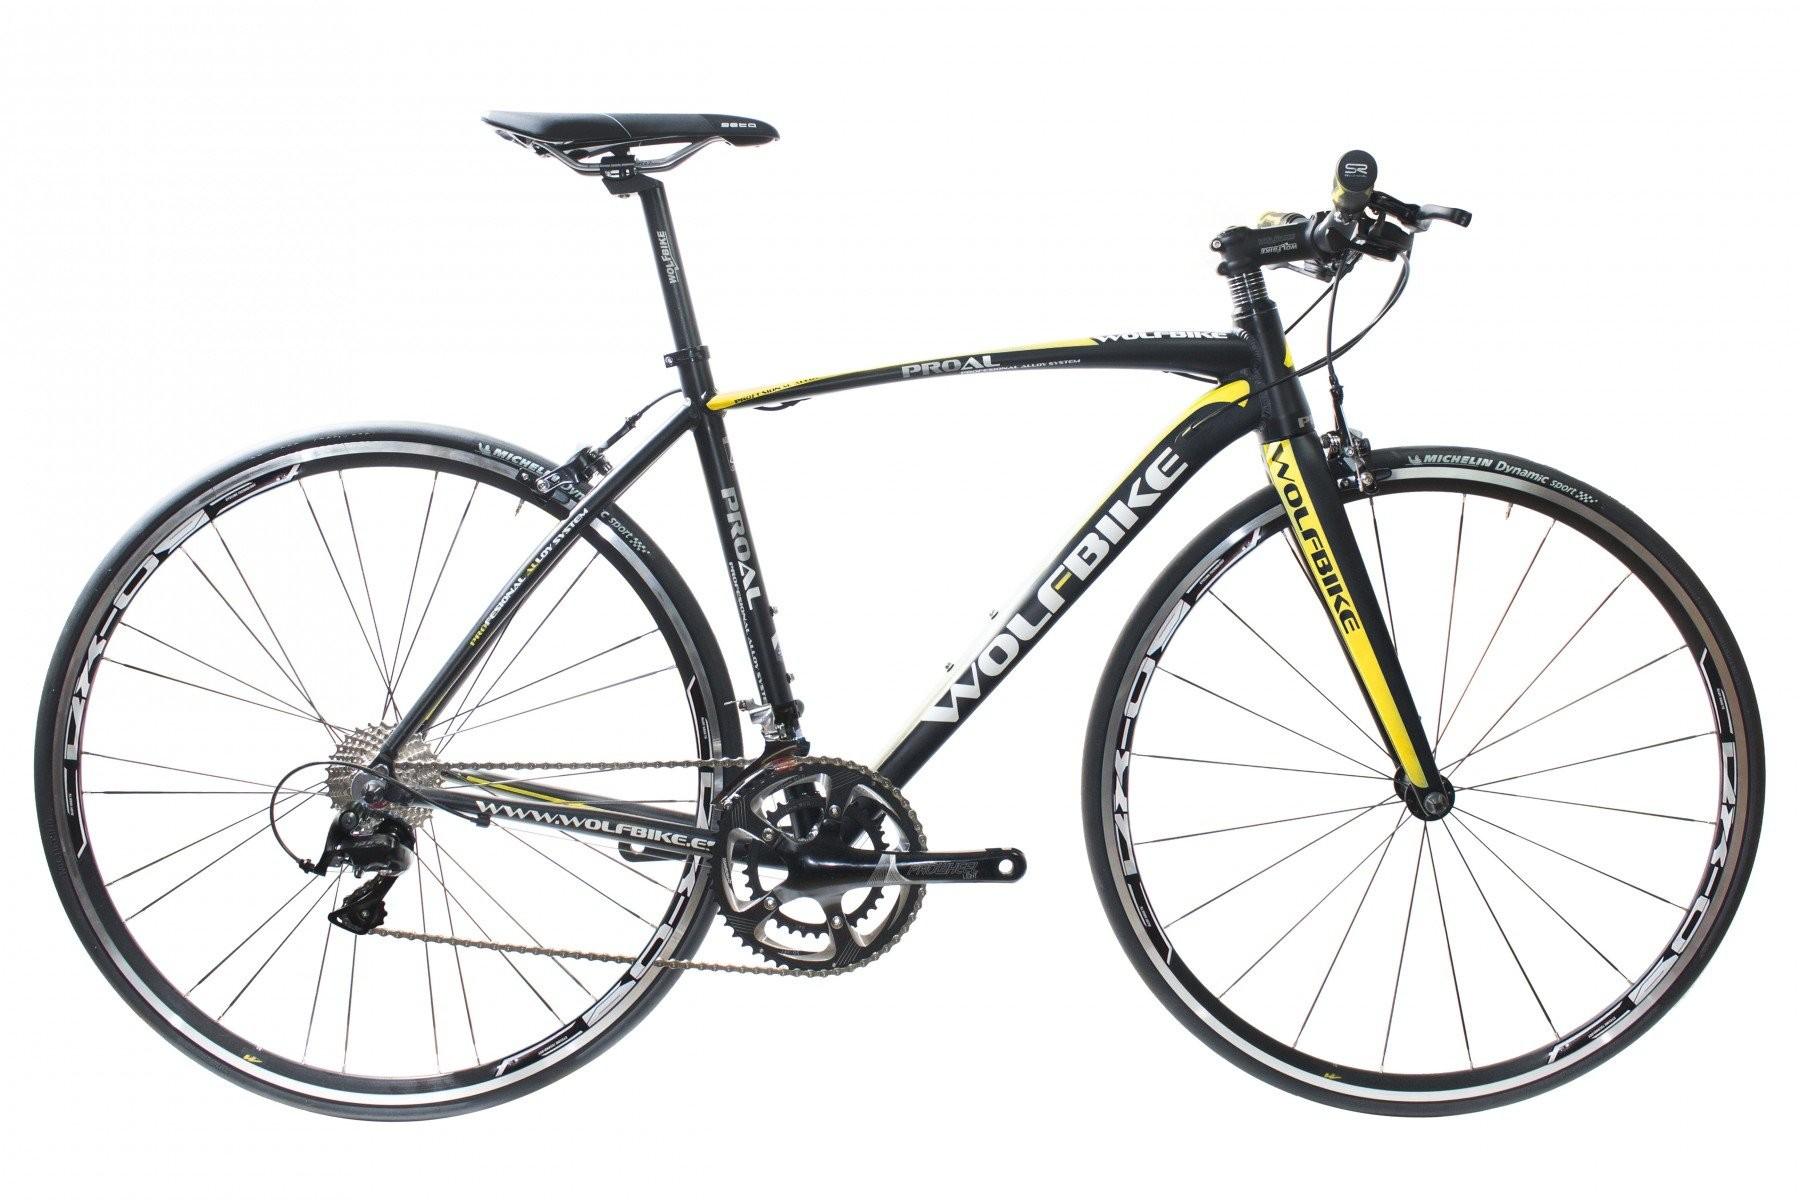 Bicicletas De Carretera Por Menos De